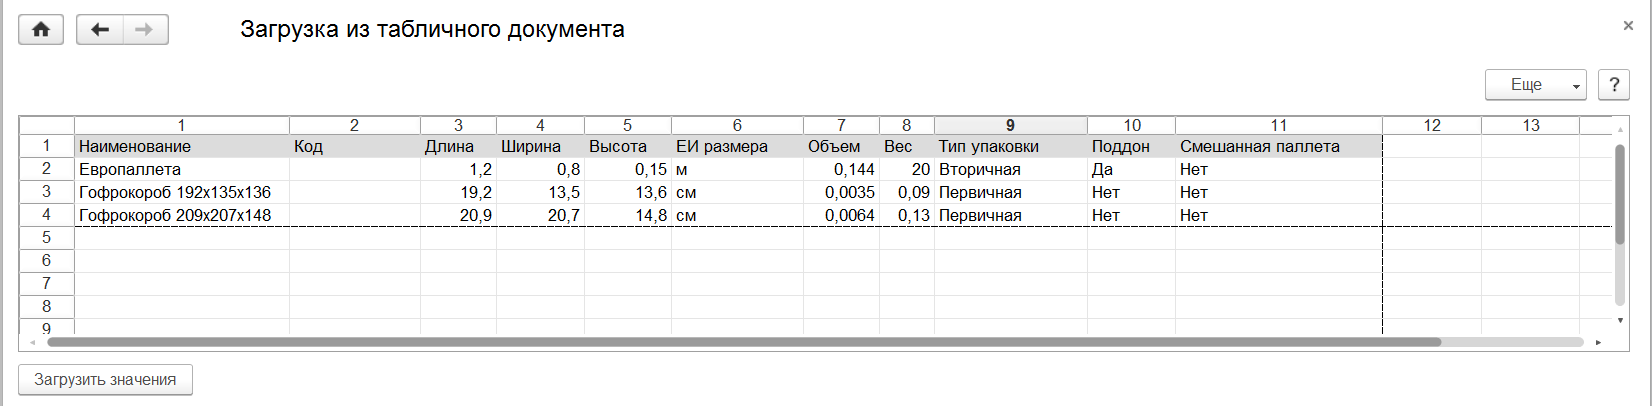 Загрузка из таблицы